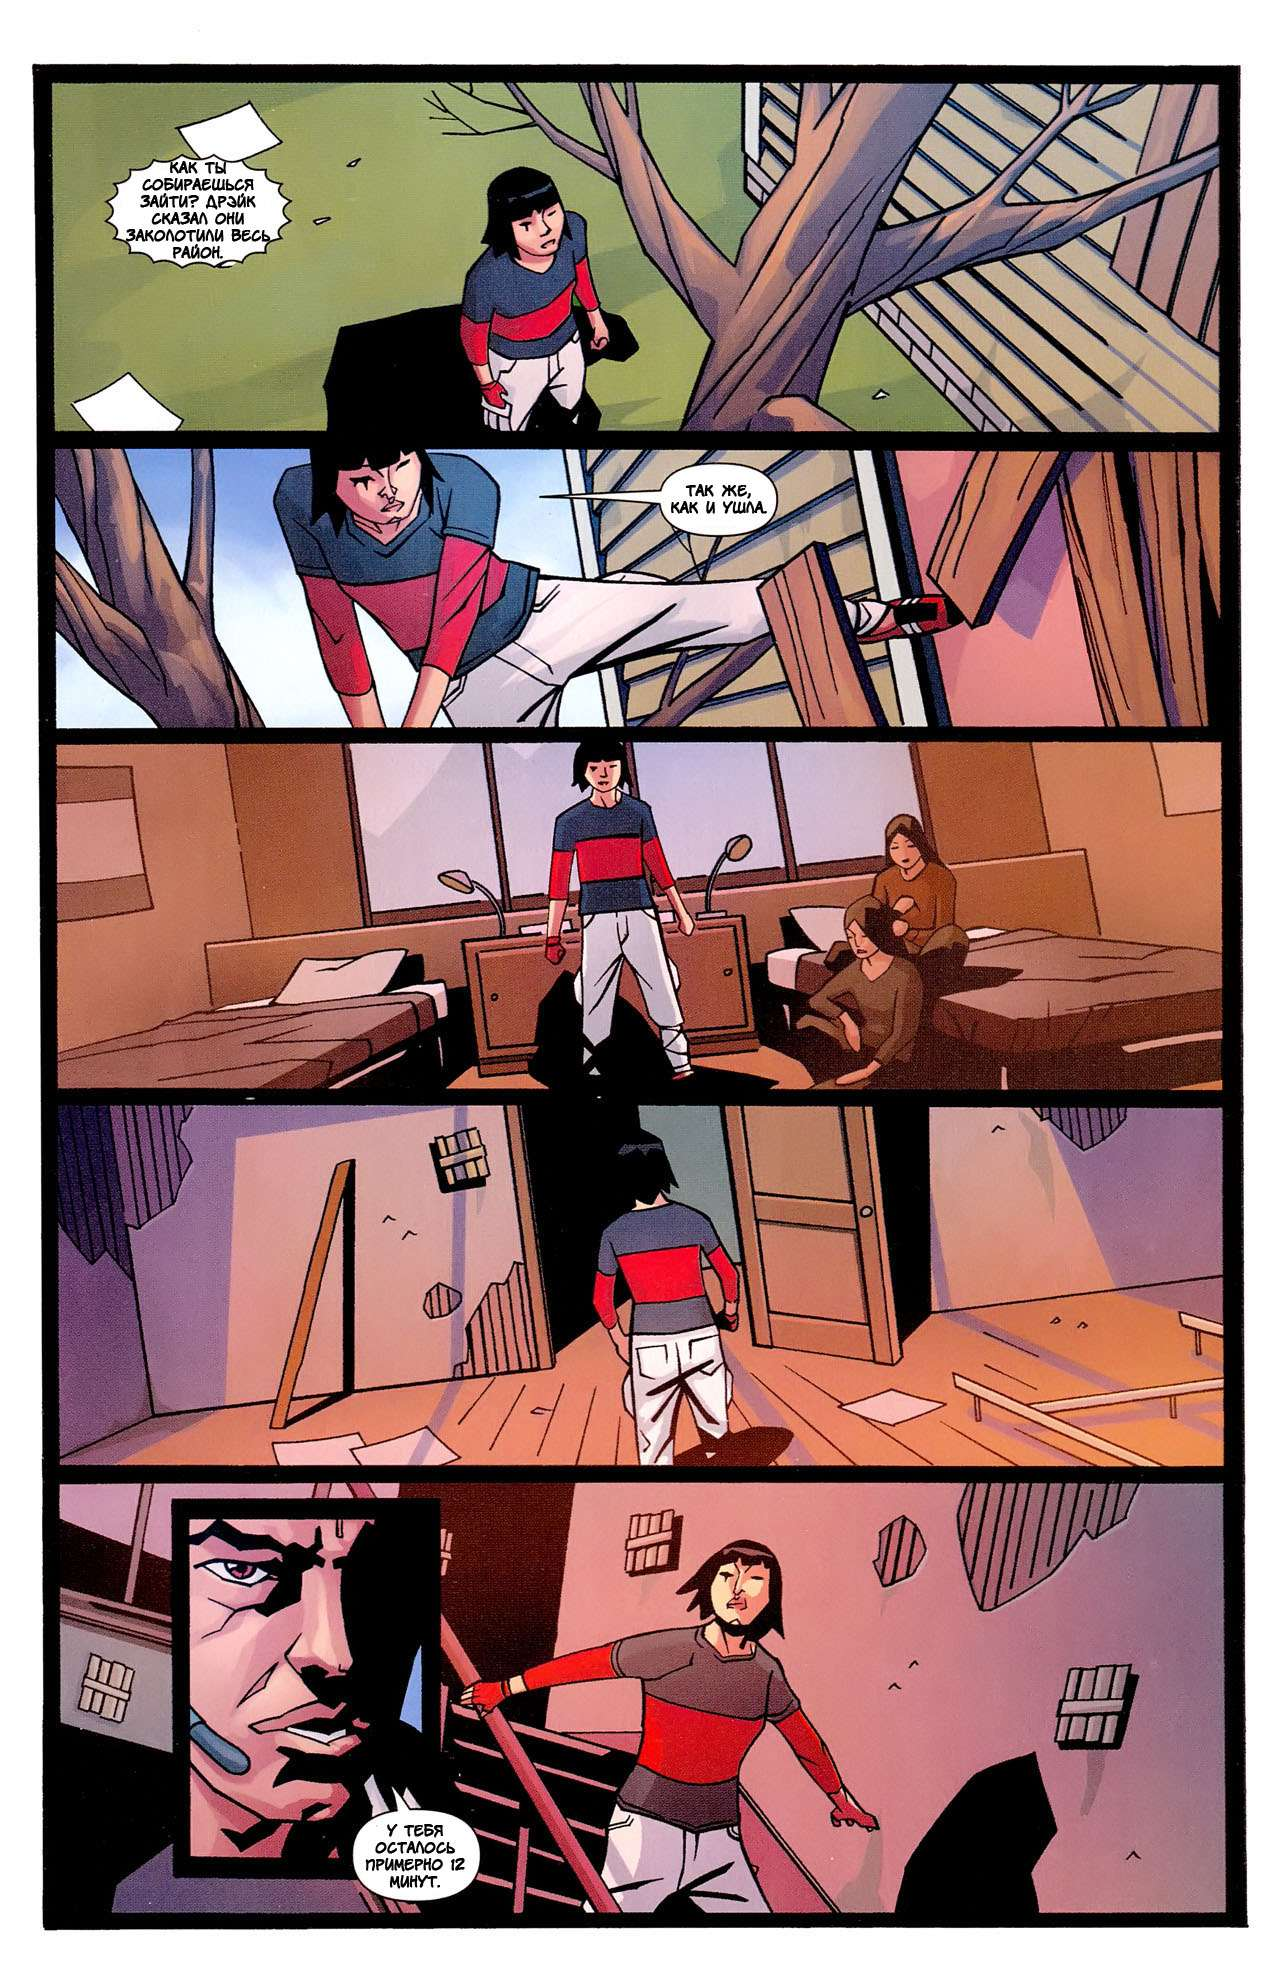 mirrors-edge-05-pg-27